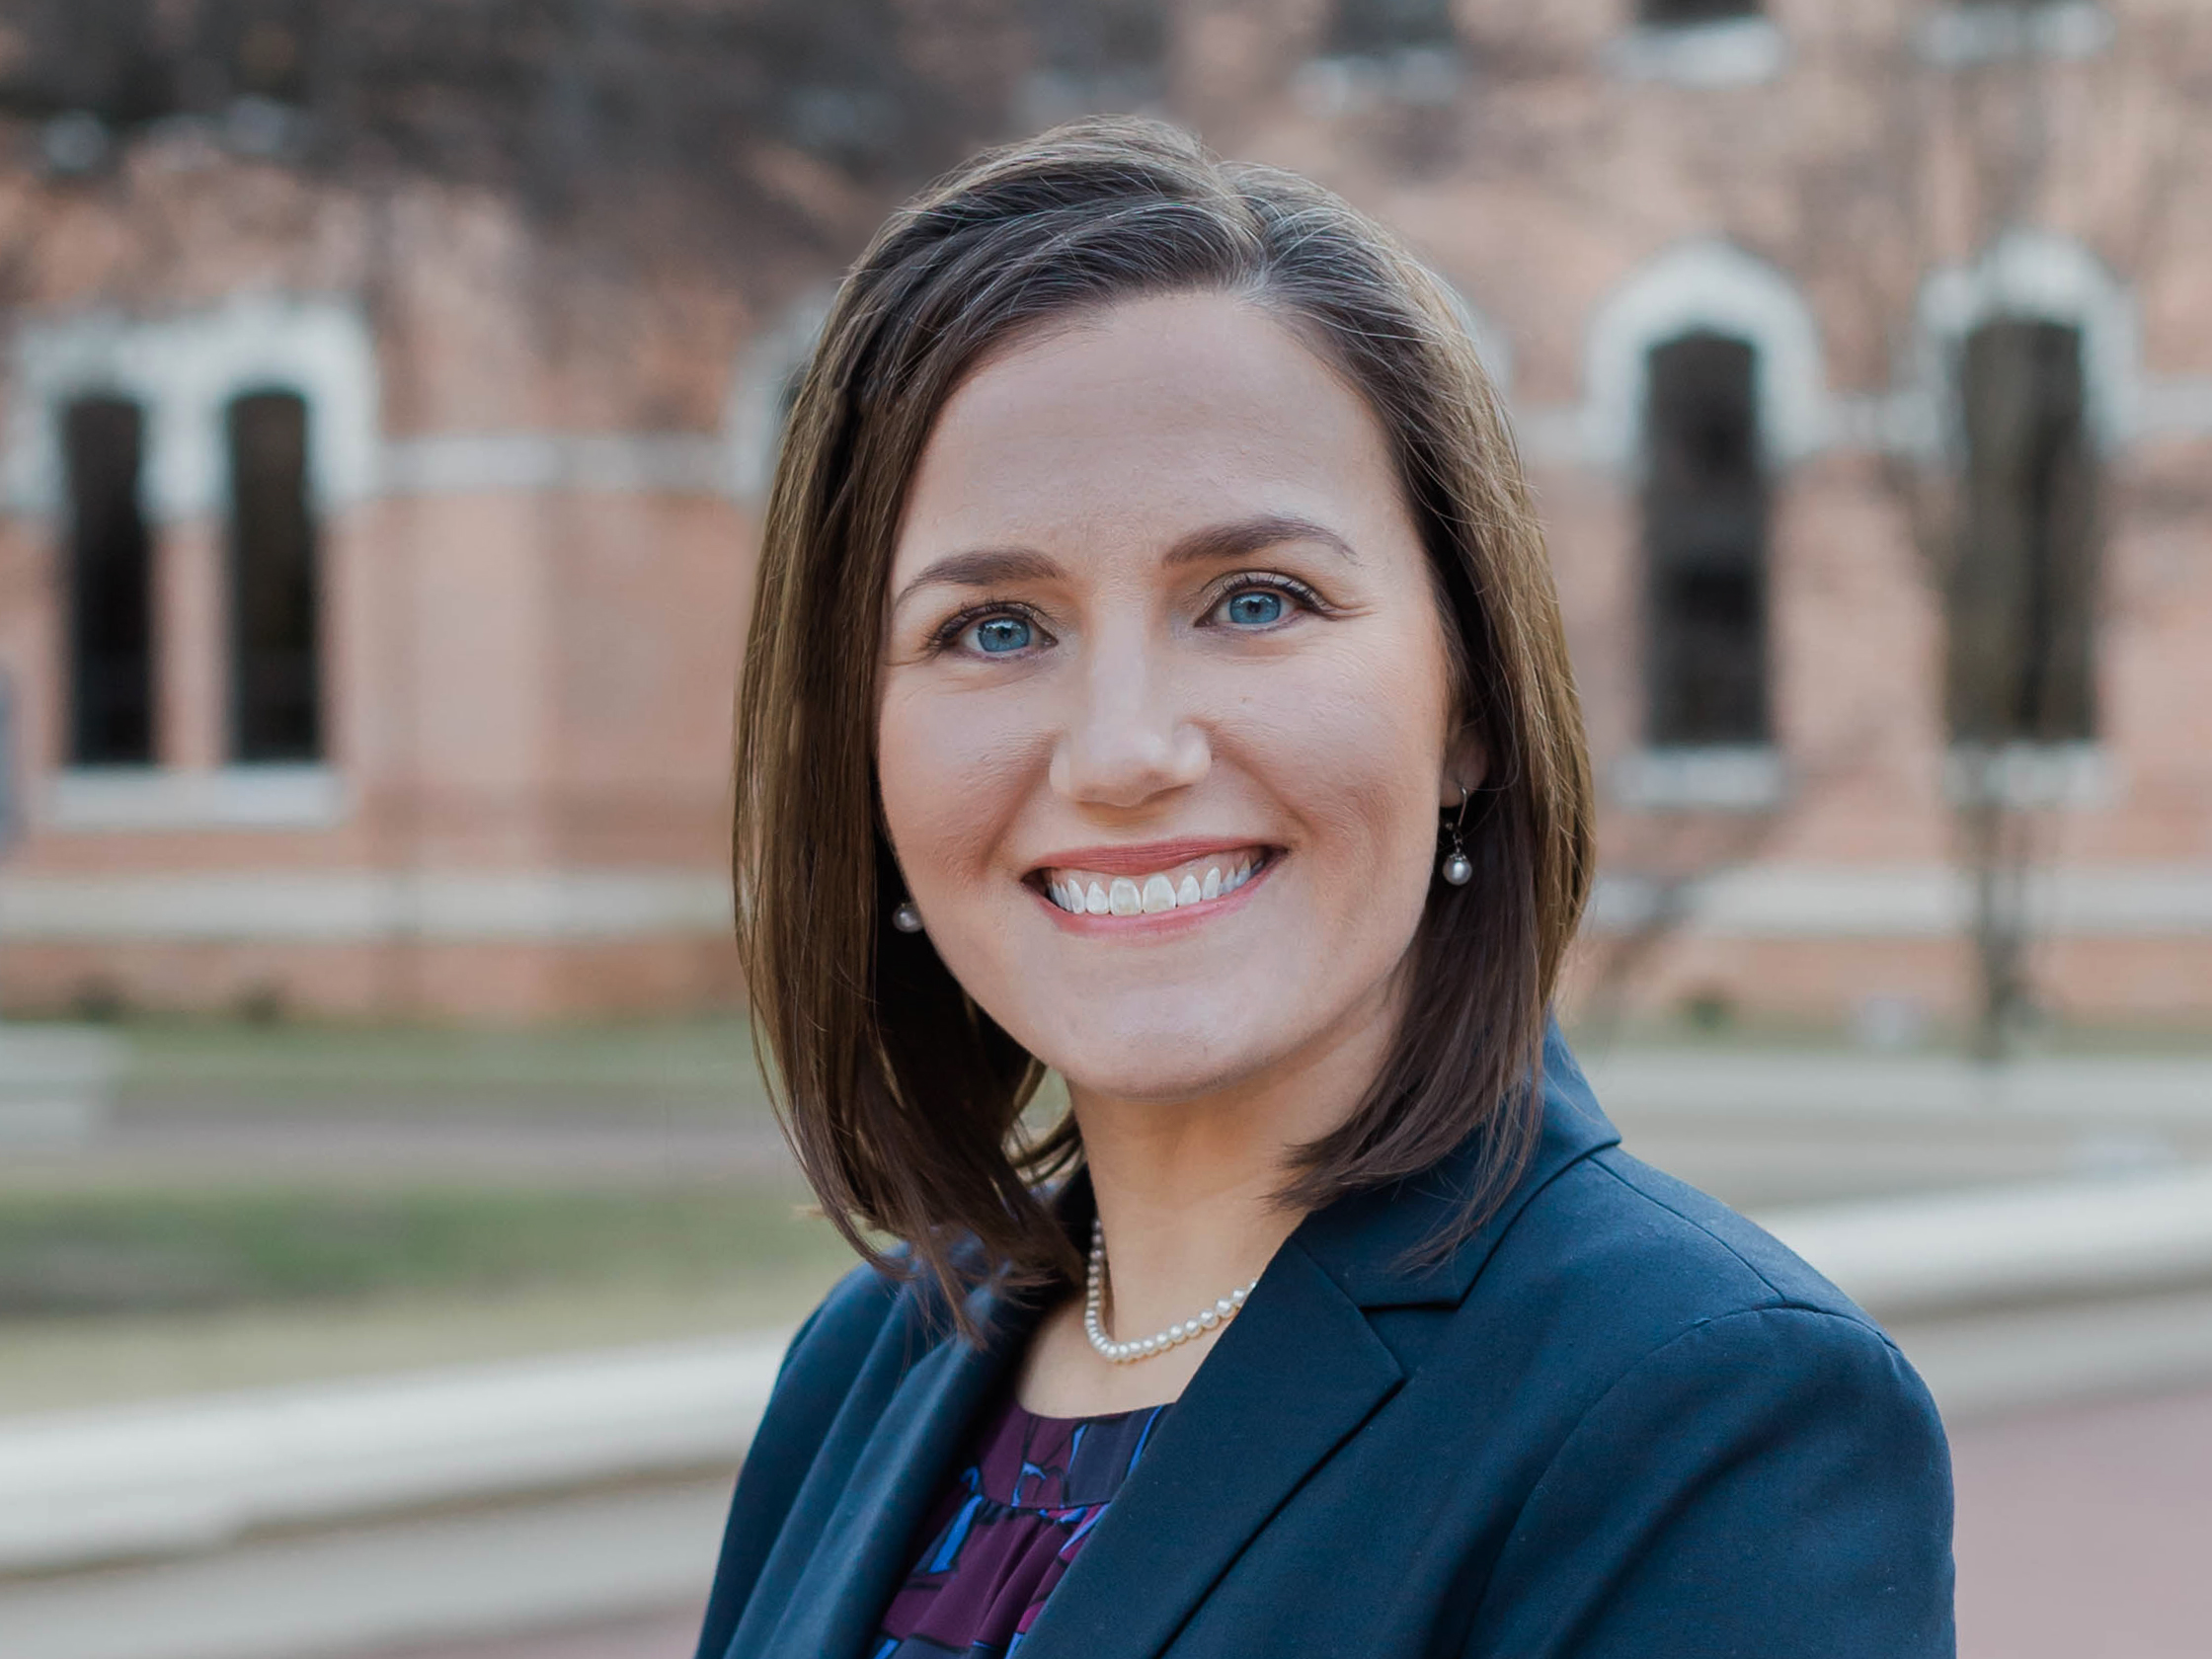 Dr. Kelly Ylitalo